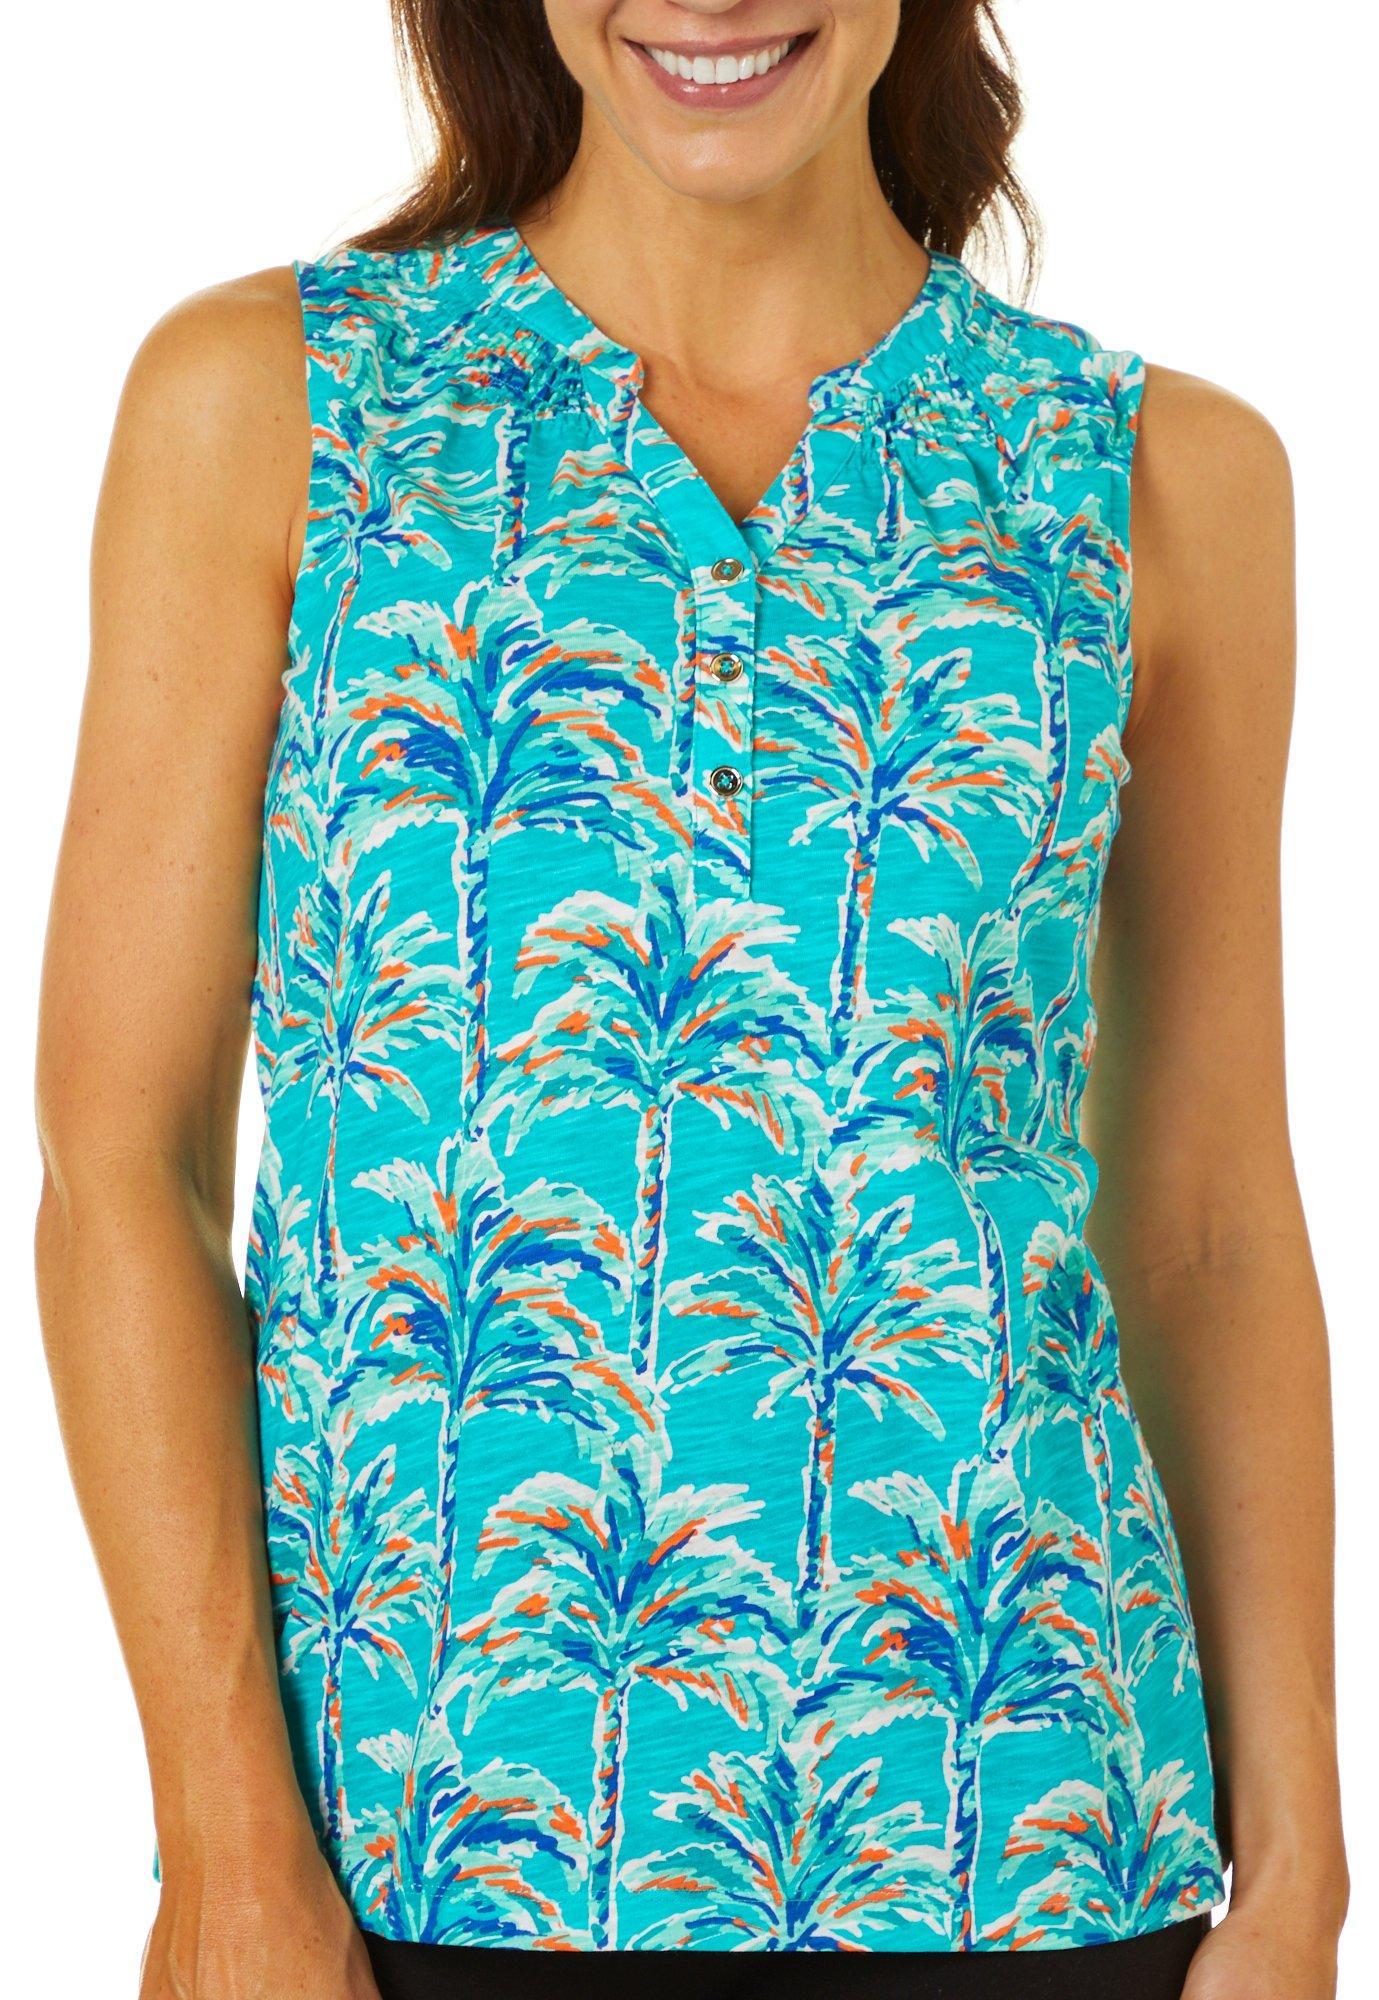 Caribbean Joe Womens Dark Tropical Floral Visor One Size Navy Blue Multi